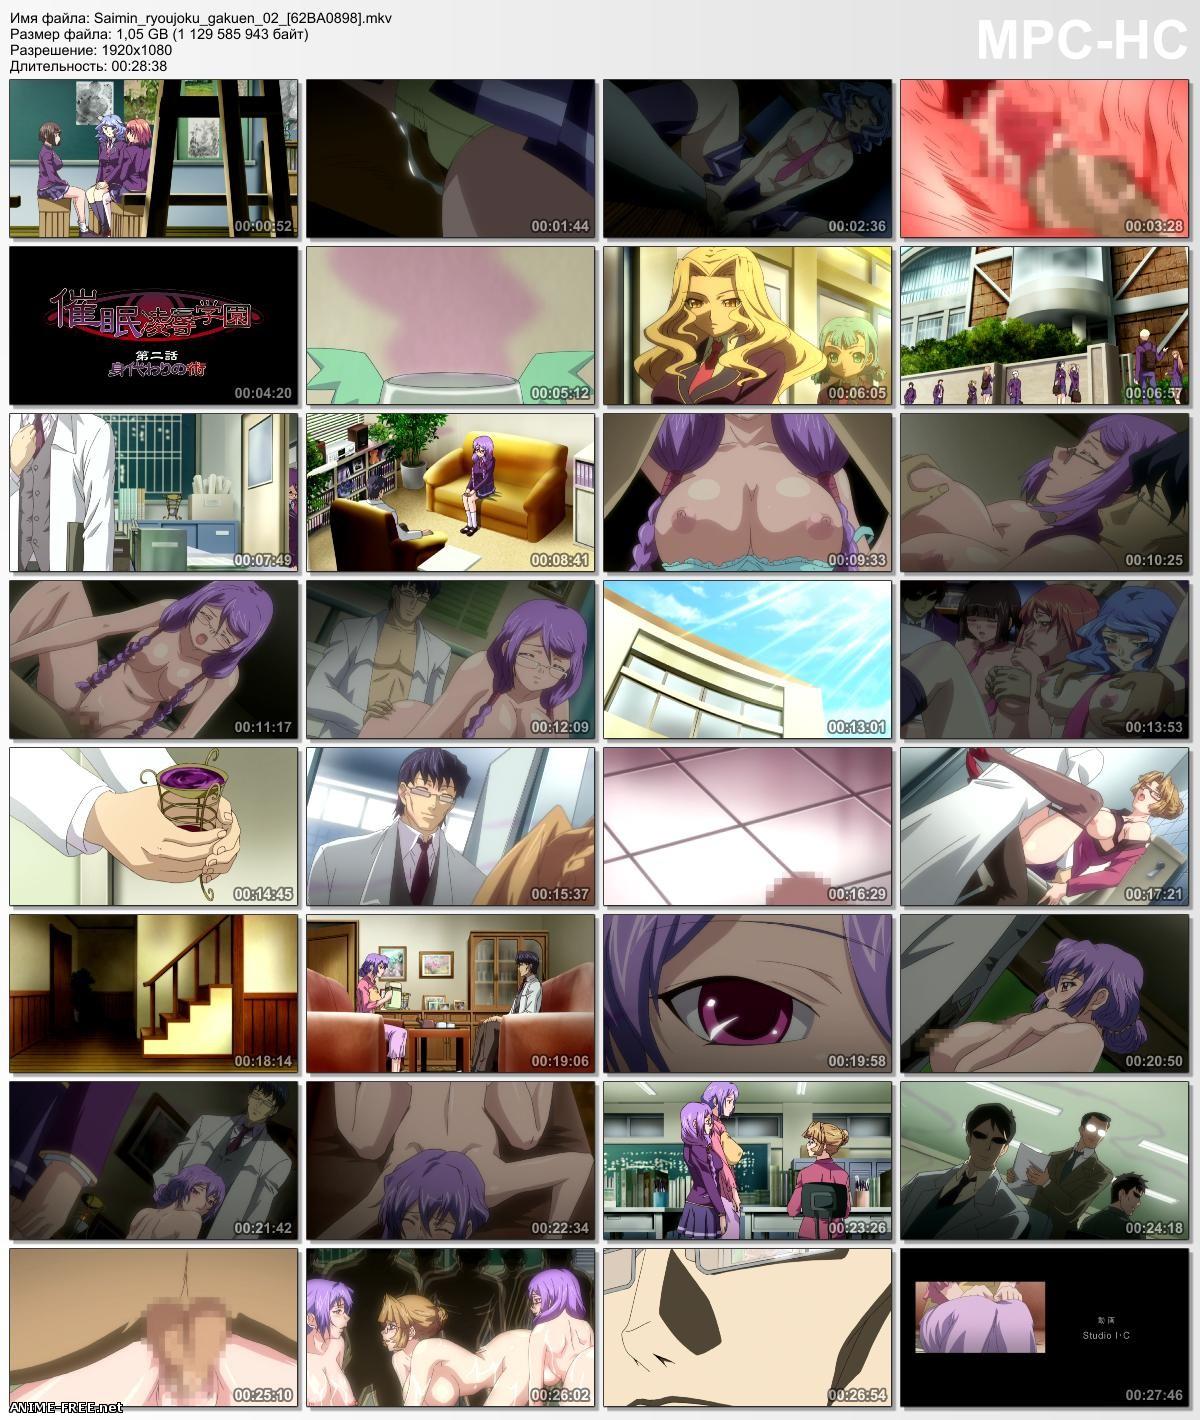 Saimin Ryoujoku Gakuen / Hypnosis Humiliation School / Школа гипнотического унижения [3 из 3] [1080p] [RUS,ENG,JAP,Multi] Anime Hentai